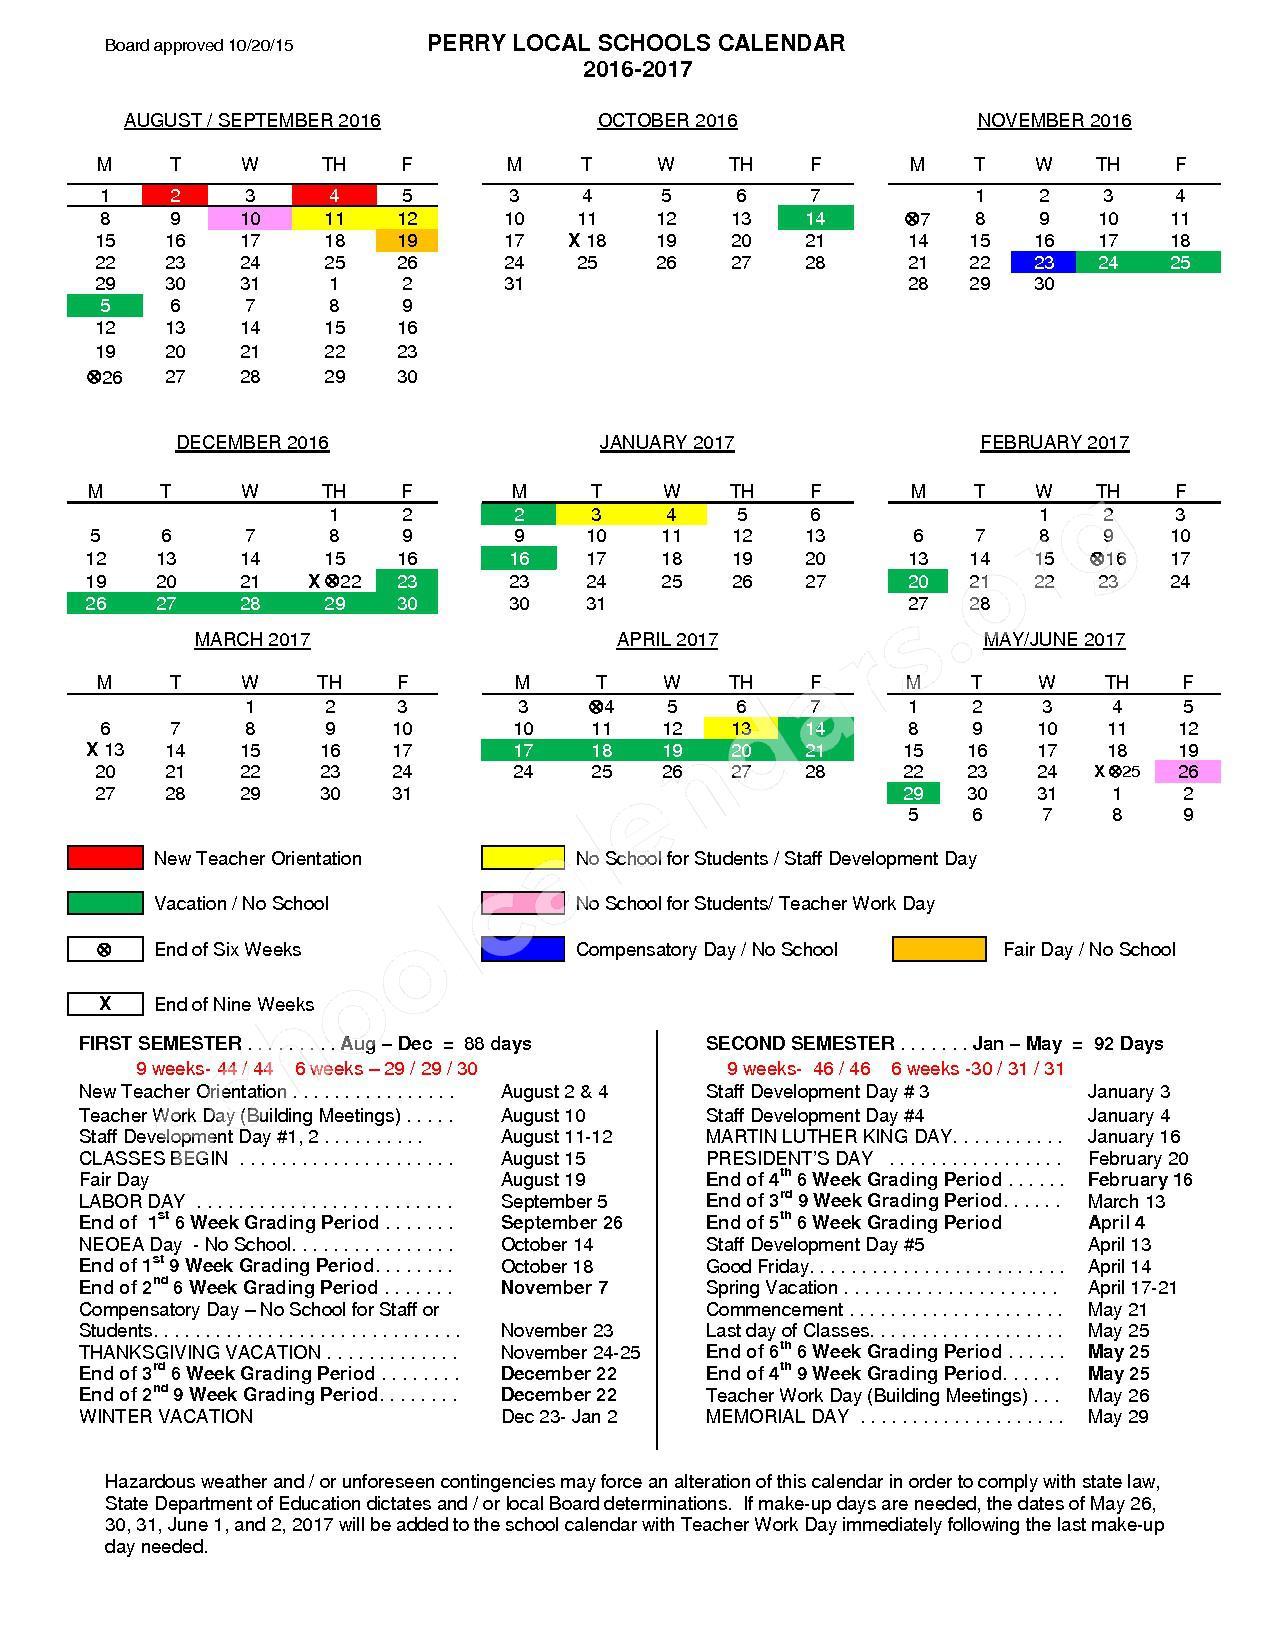 2016 - 2017 School Calendar – Perry Local Schools (Lake County) – page 1